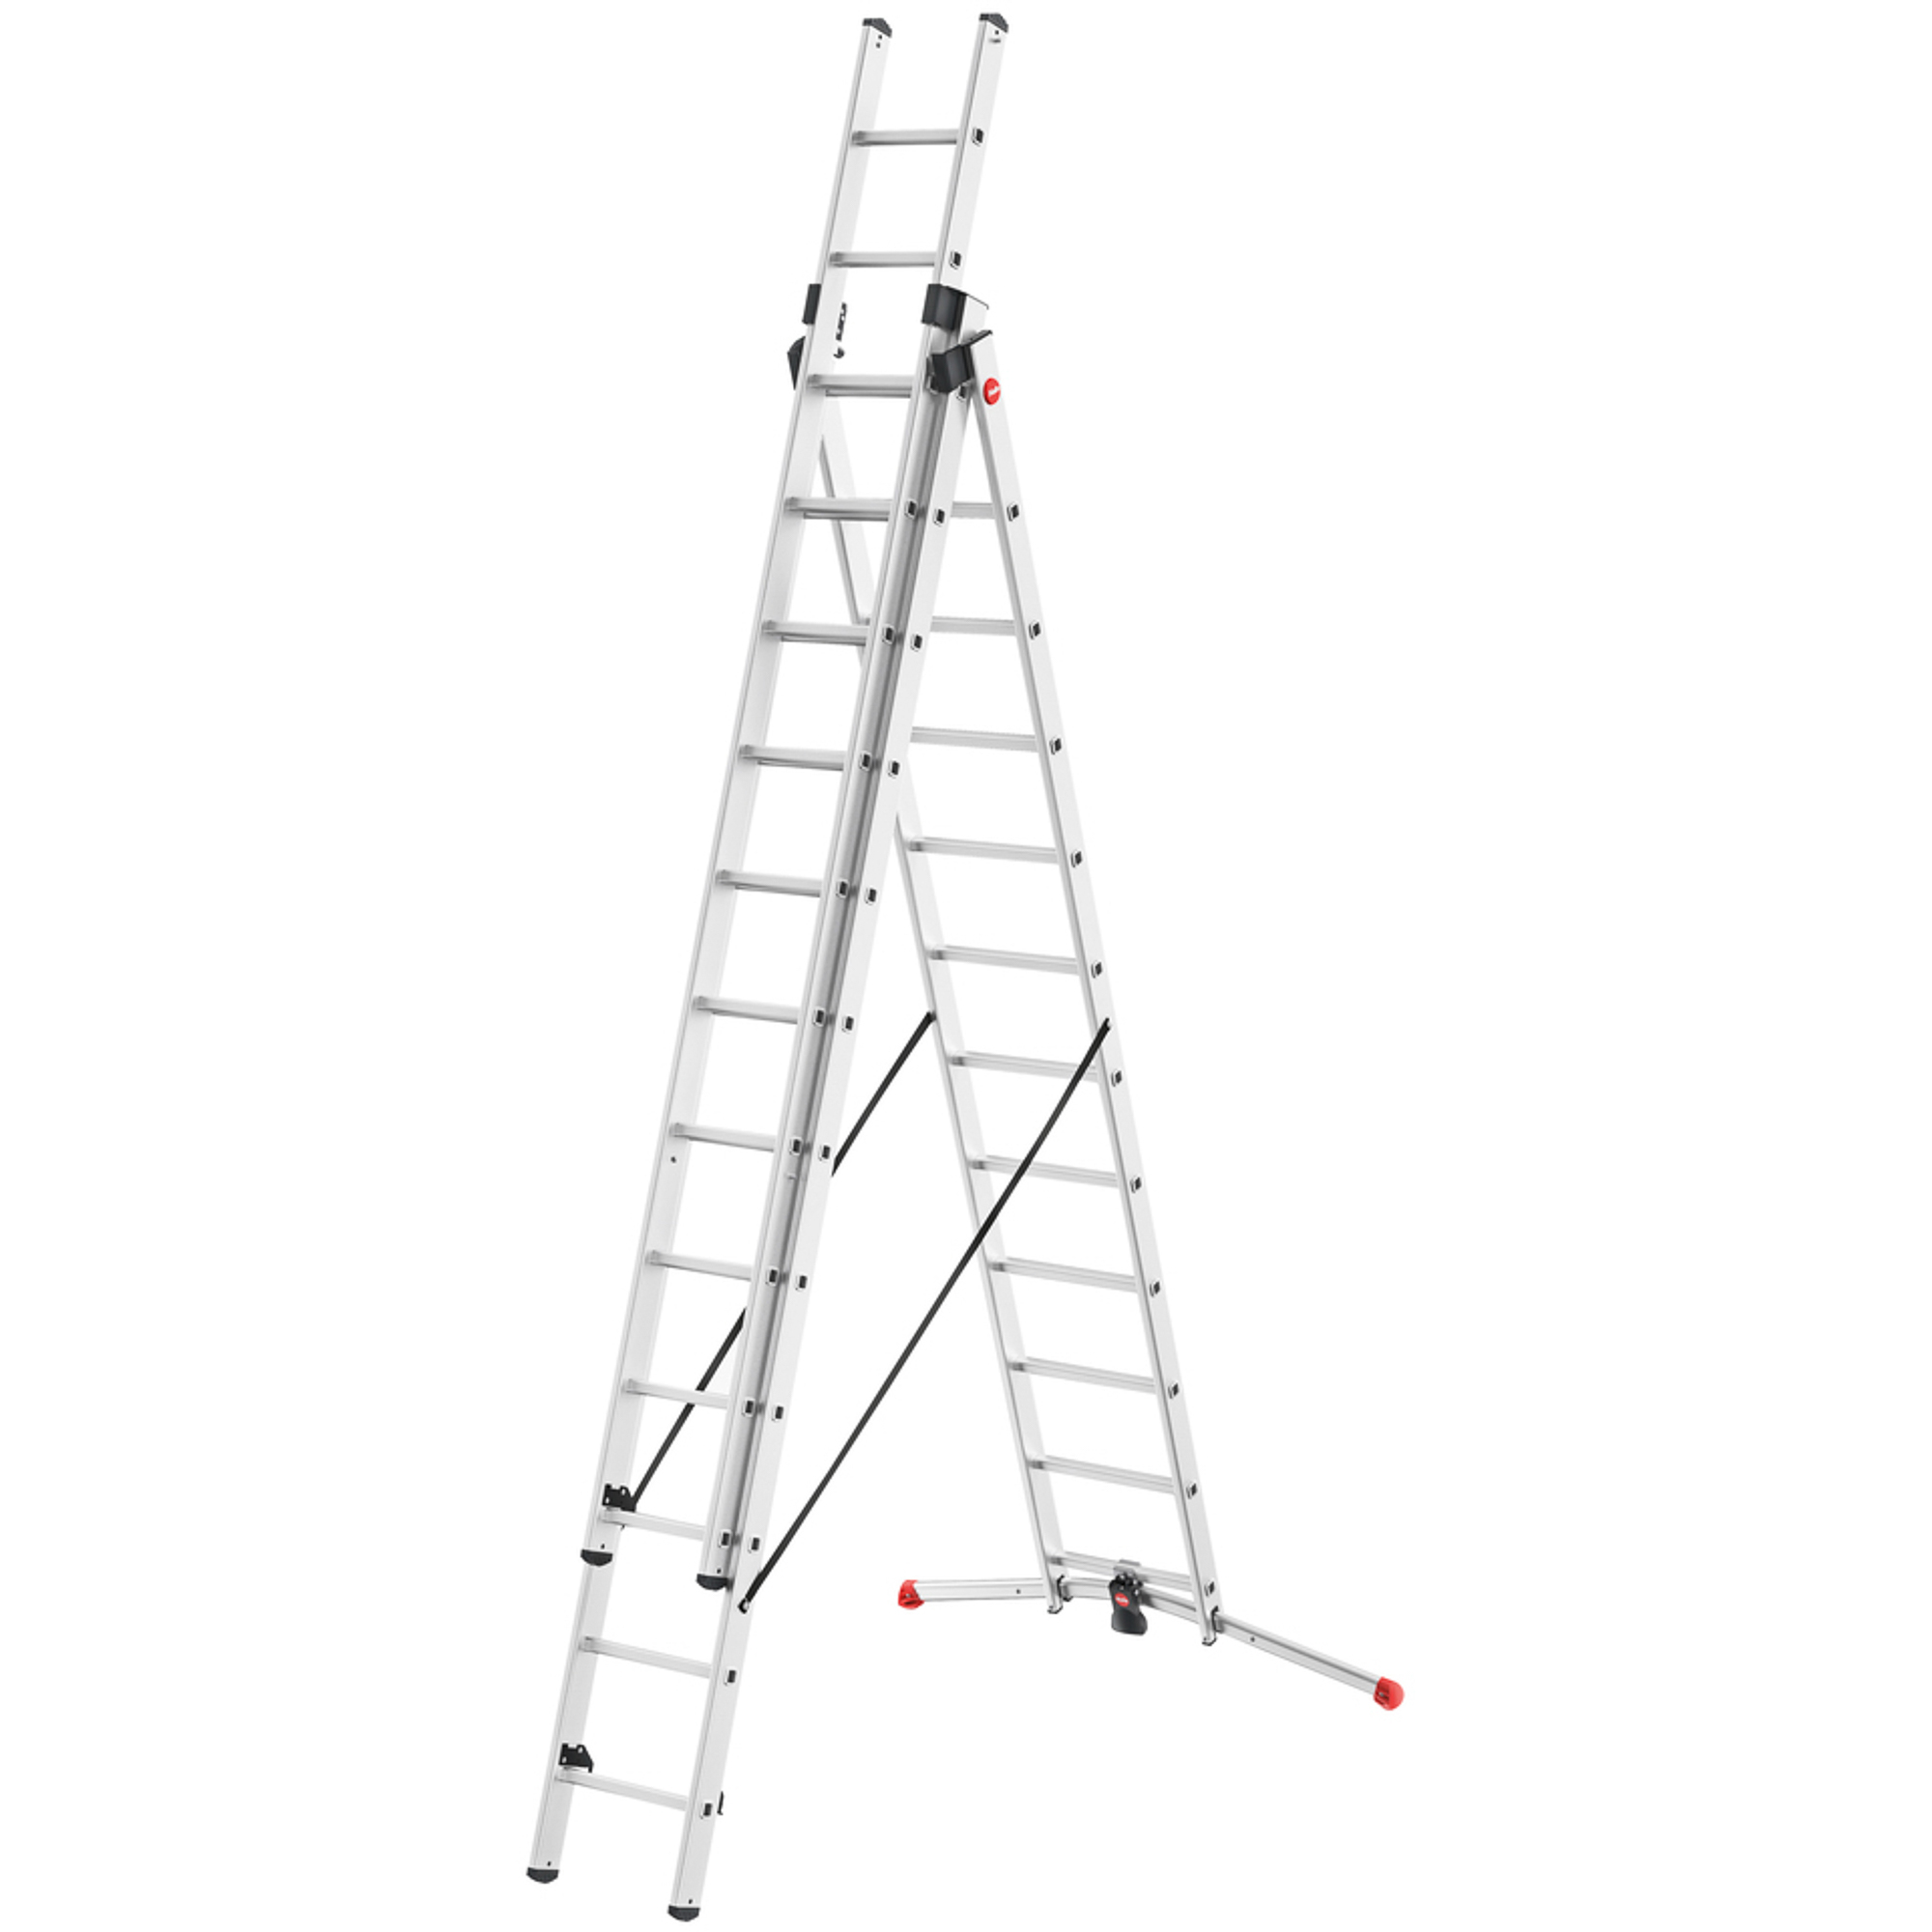 Лестница-стремянка 3х12ступеней Hailo стремянка табурет 2 ступени hailo